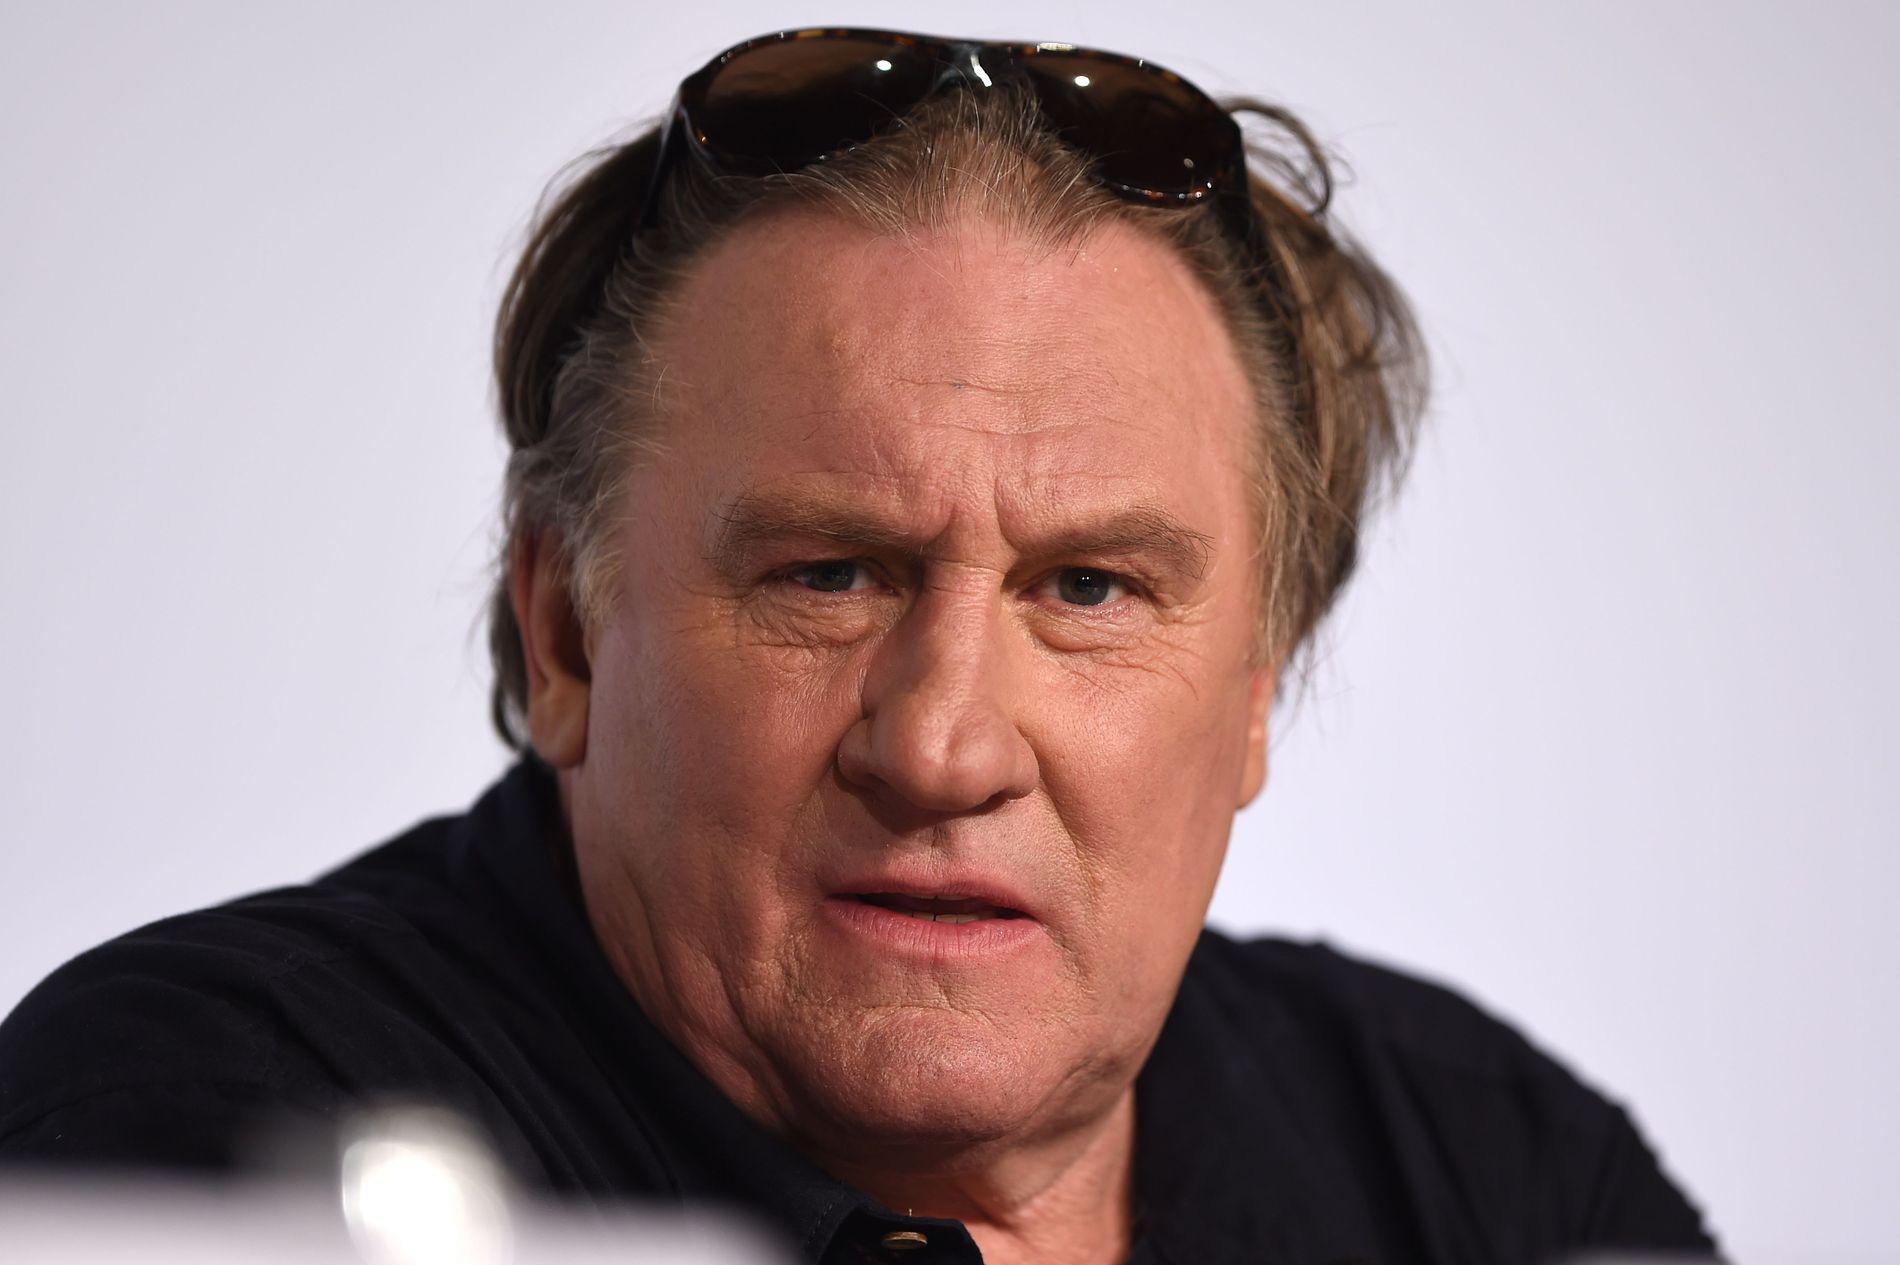 VOLDTEKTSANKLAGER: Den franske skuespilleren Gérard Depardieu anklages for voldtekt av en ung kvinne. Bildet er tatt under filmfestivalen i Cannes i 2015.